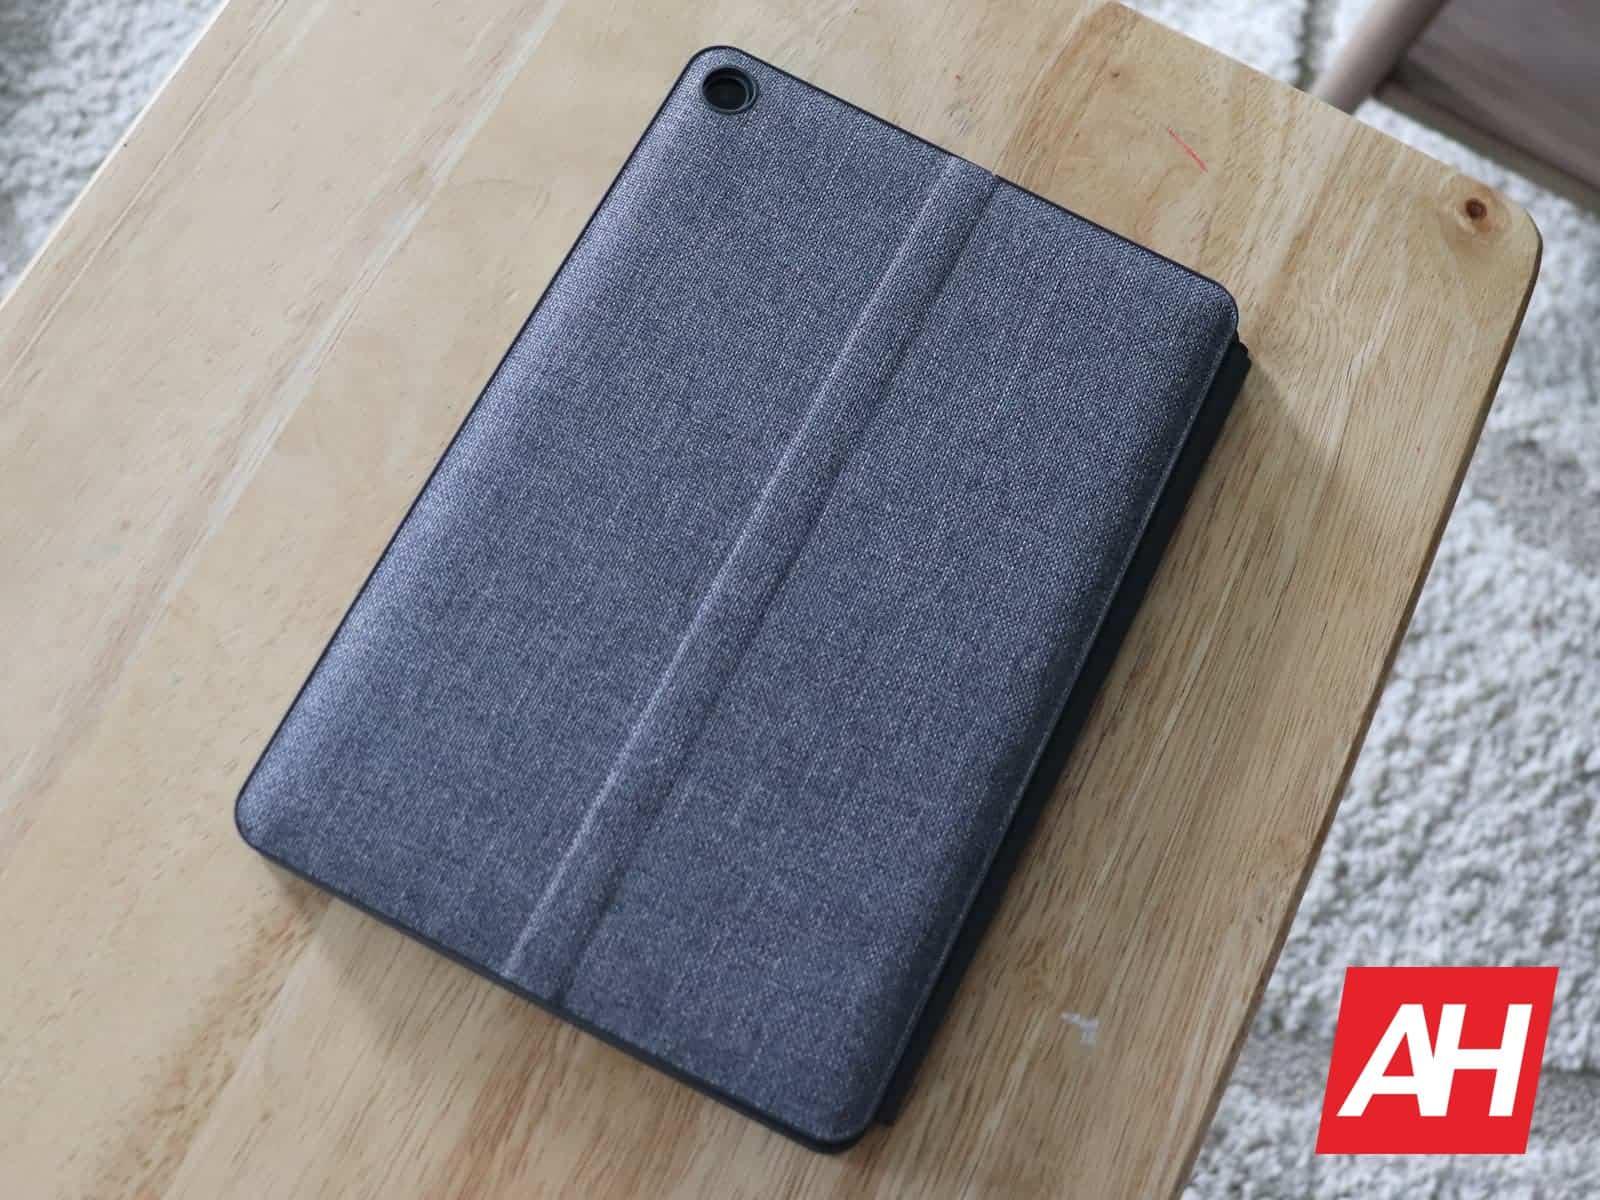 03 4 Lenovo IdeaPad Duet Hardware AH 2020